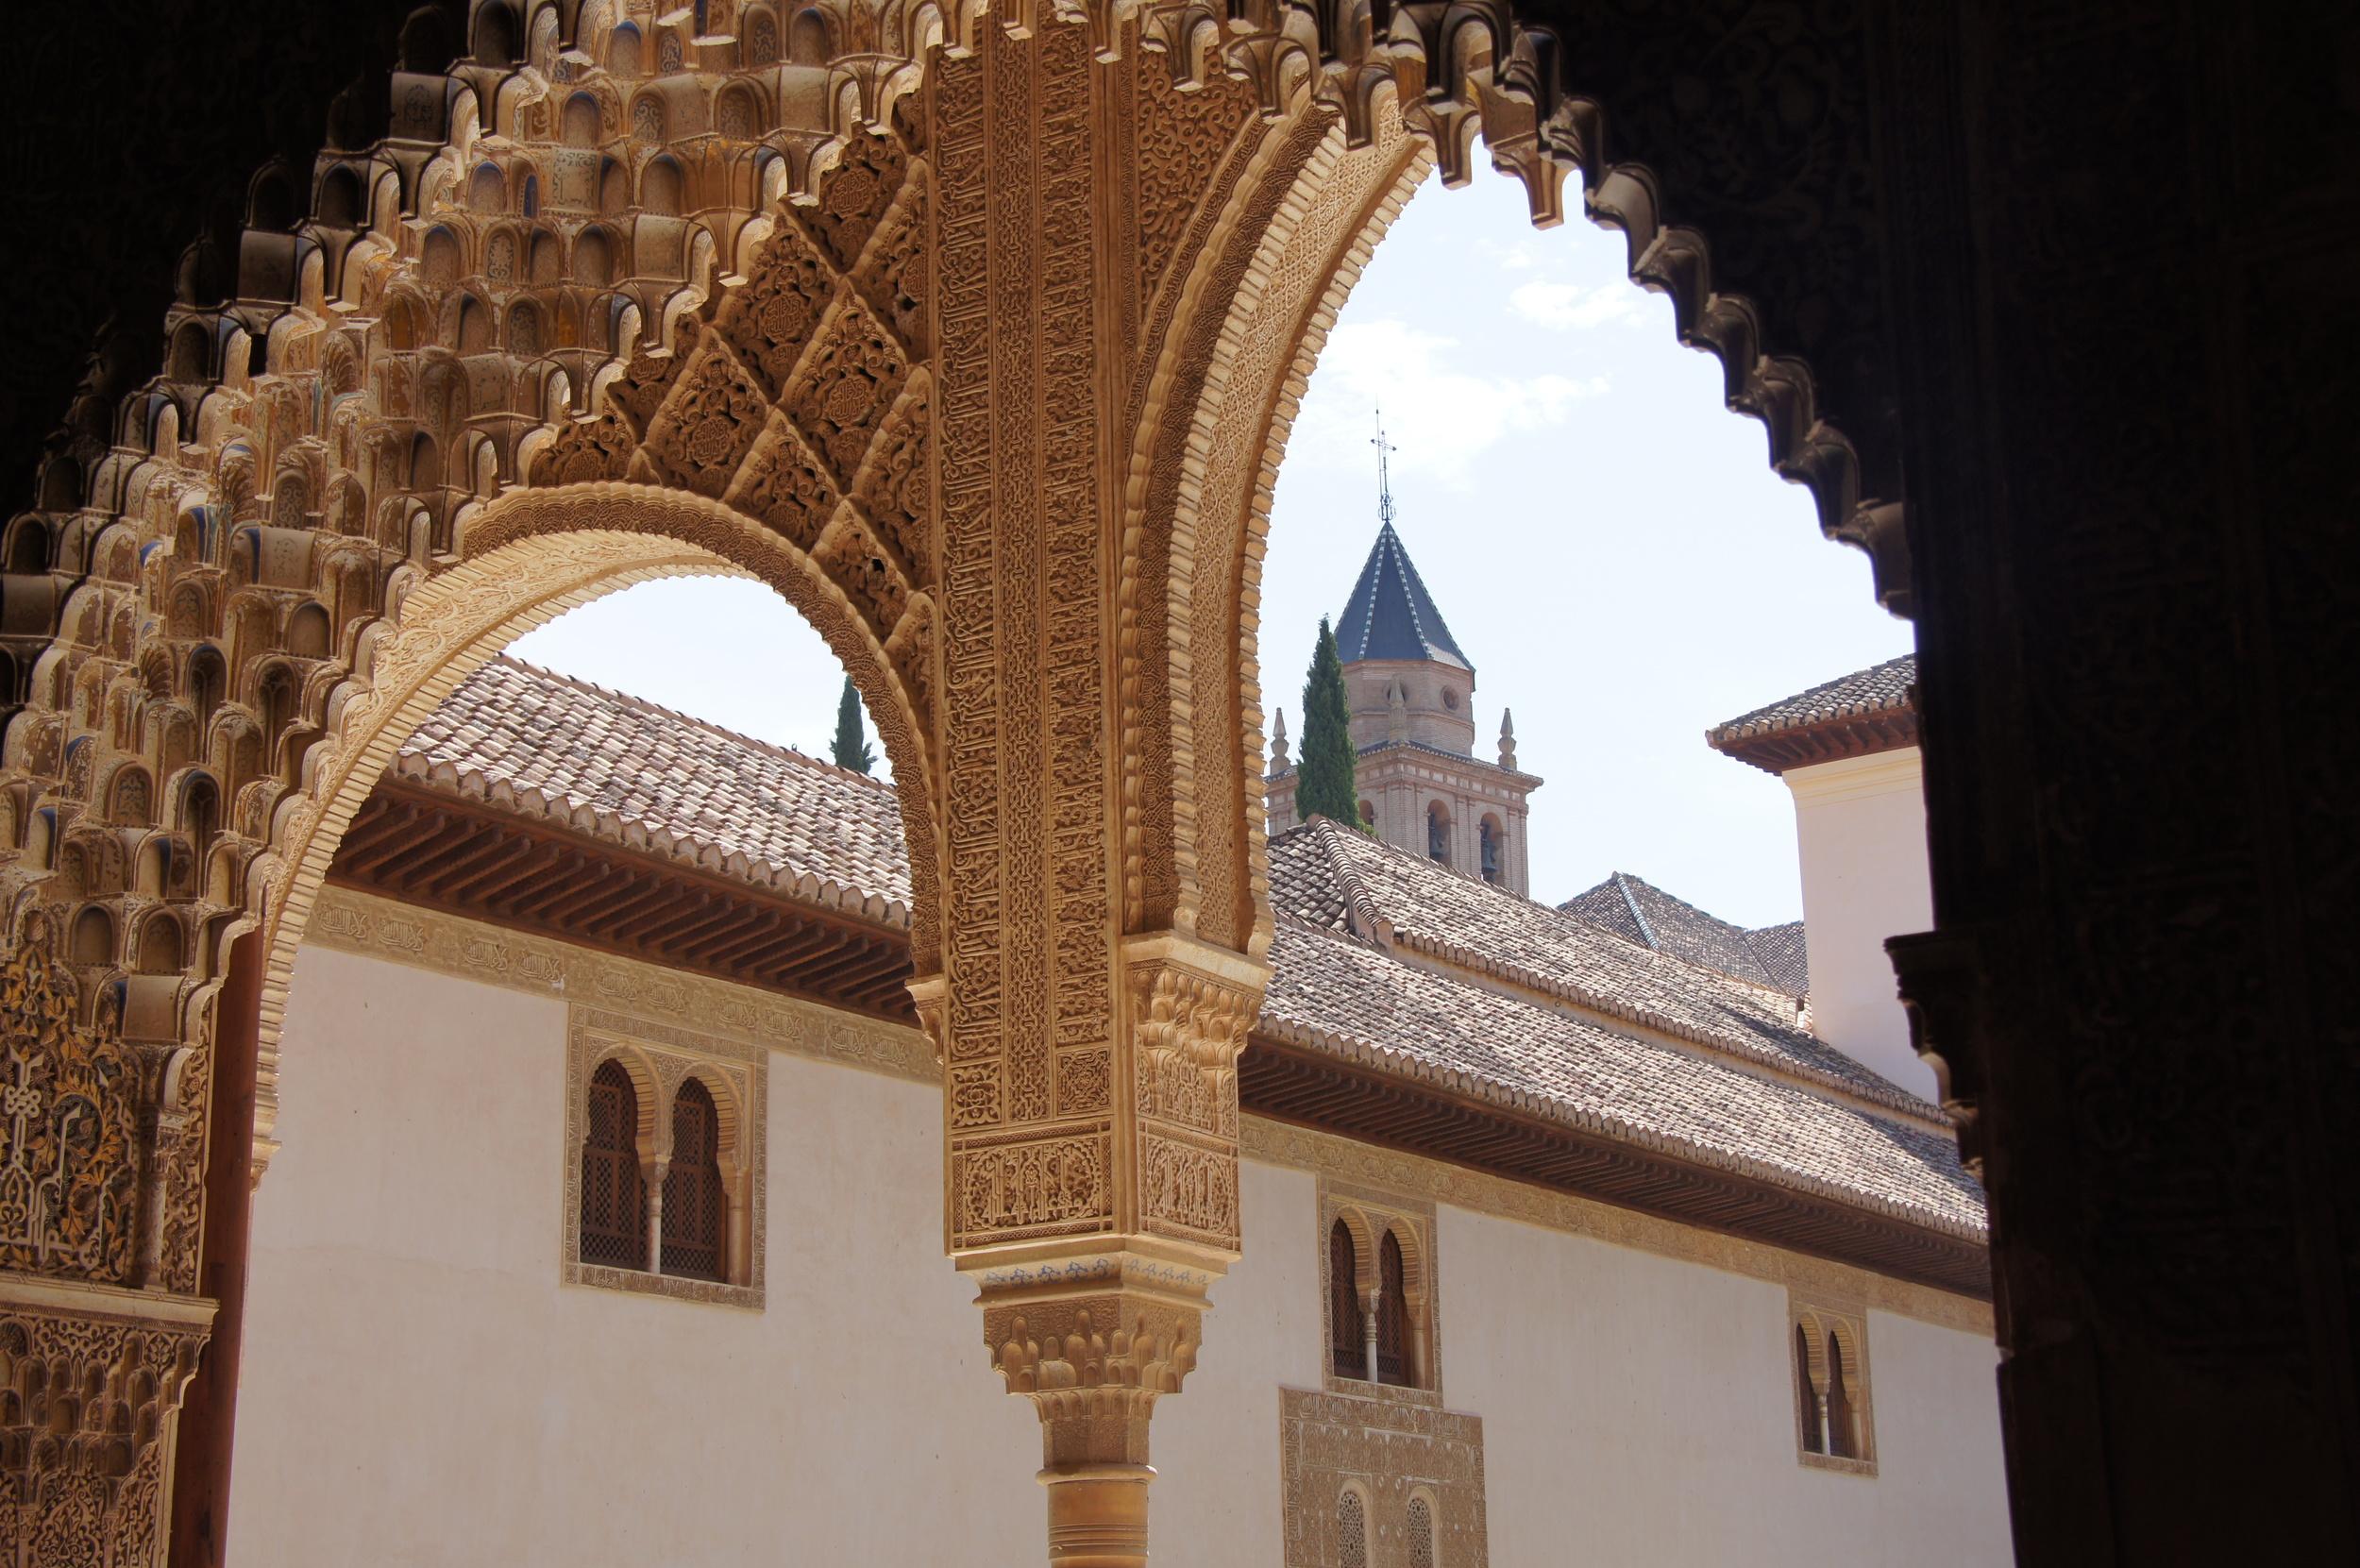 Trip to Granada, Spain - Alhambra